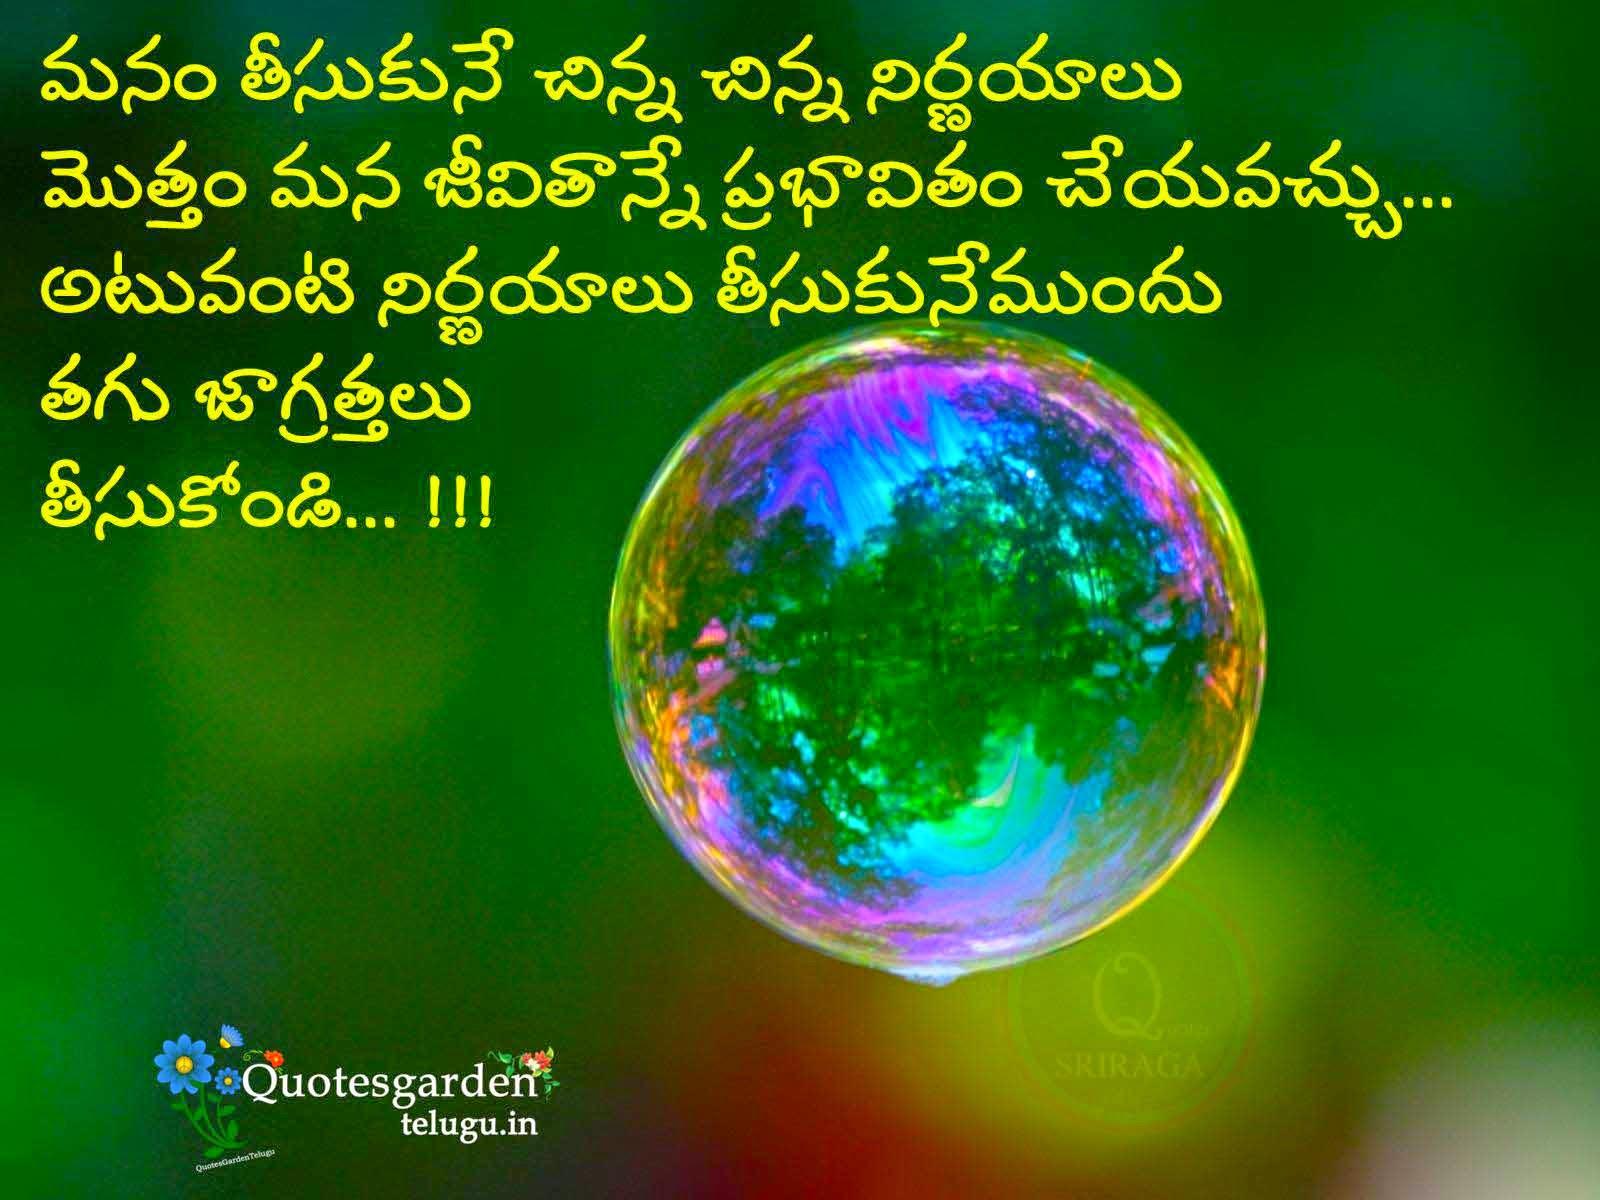 Best Quotes For Whatsapp Status In Telugu